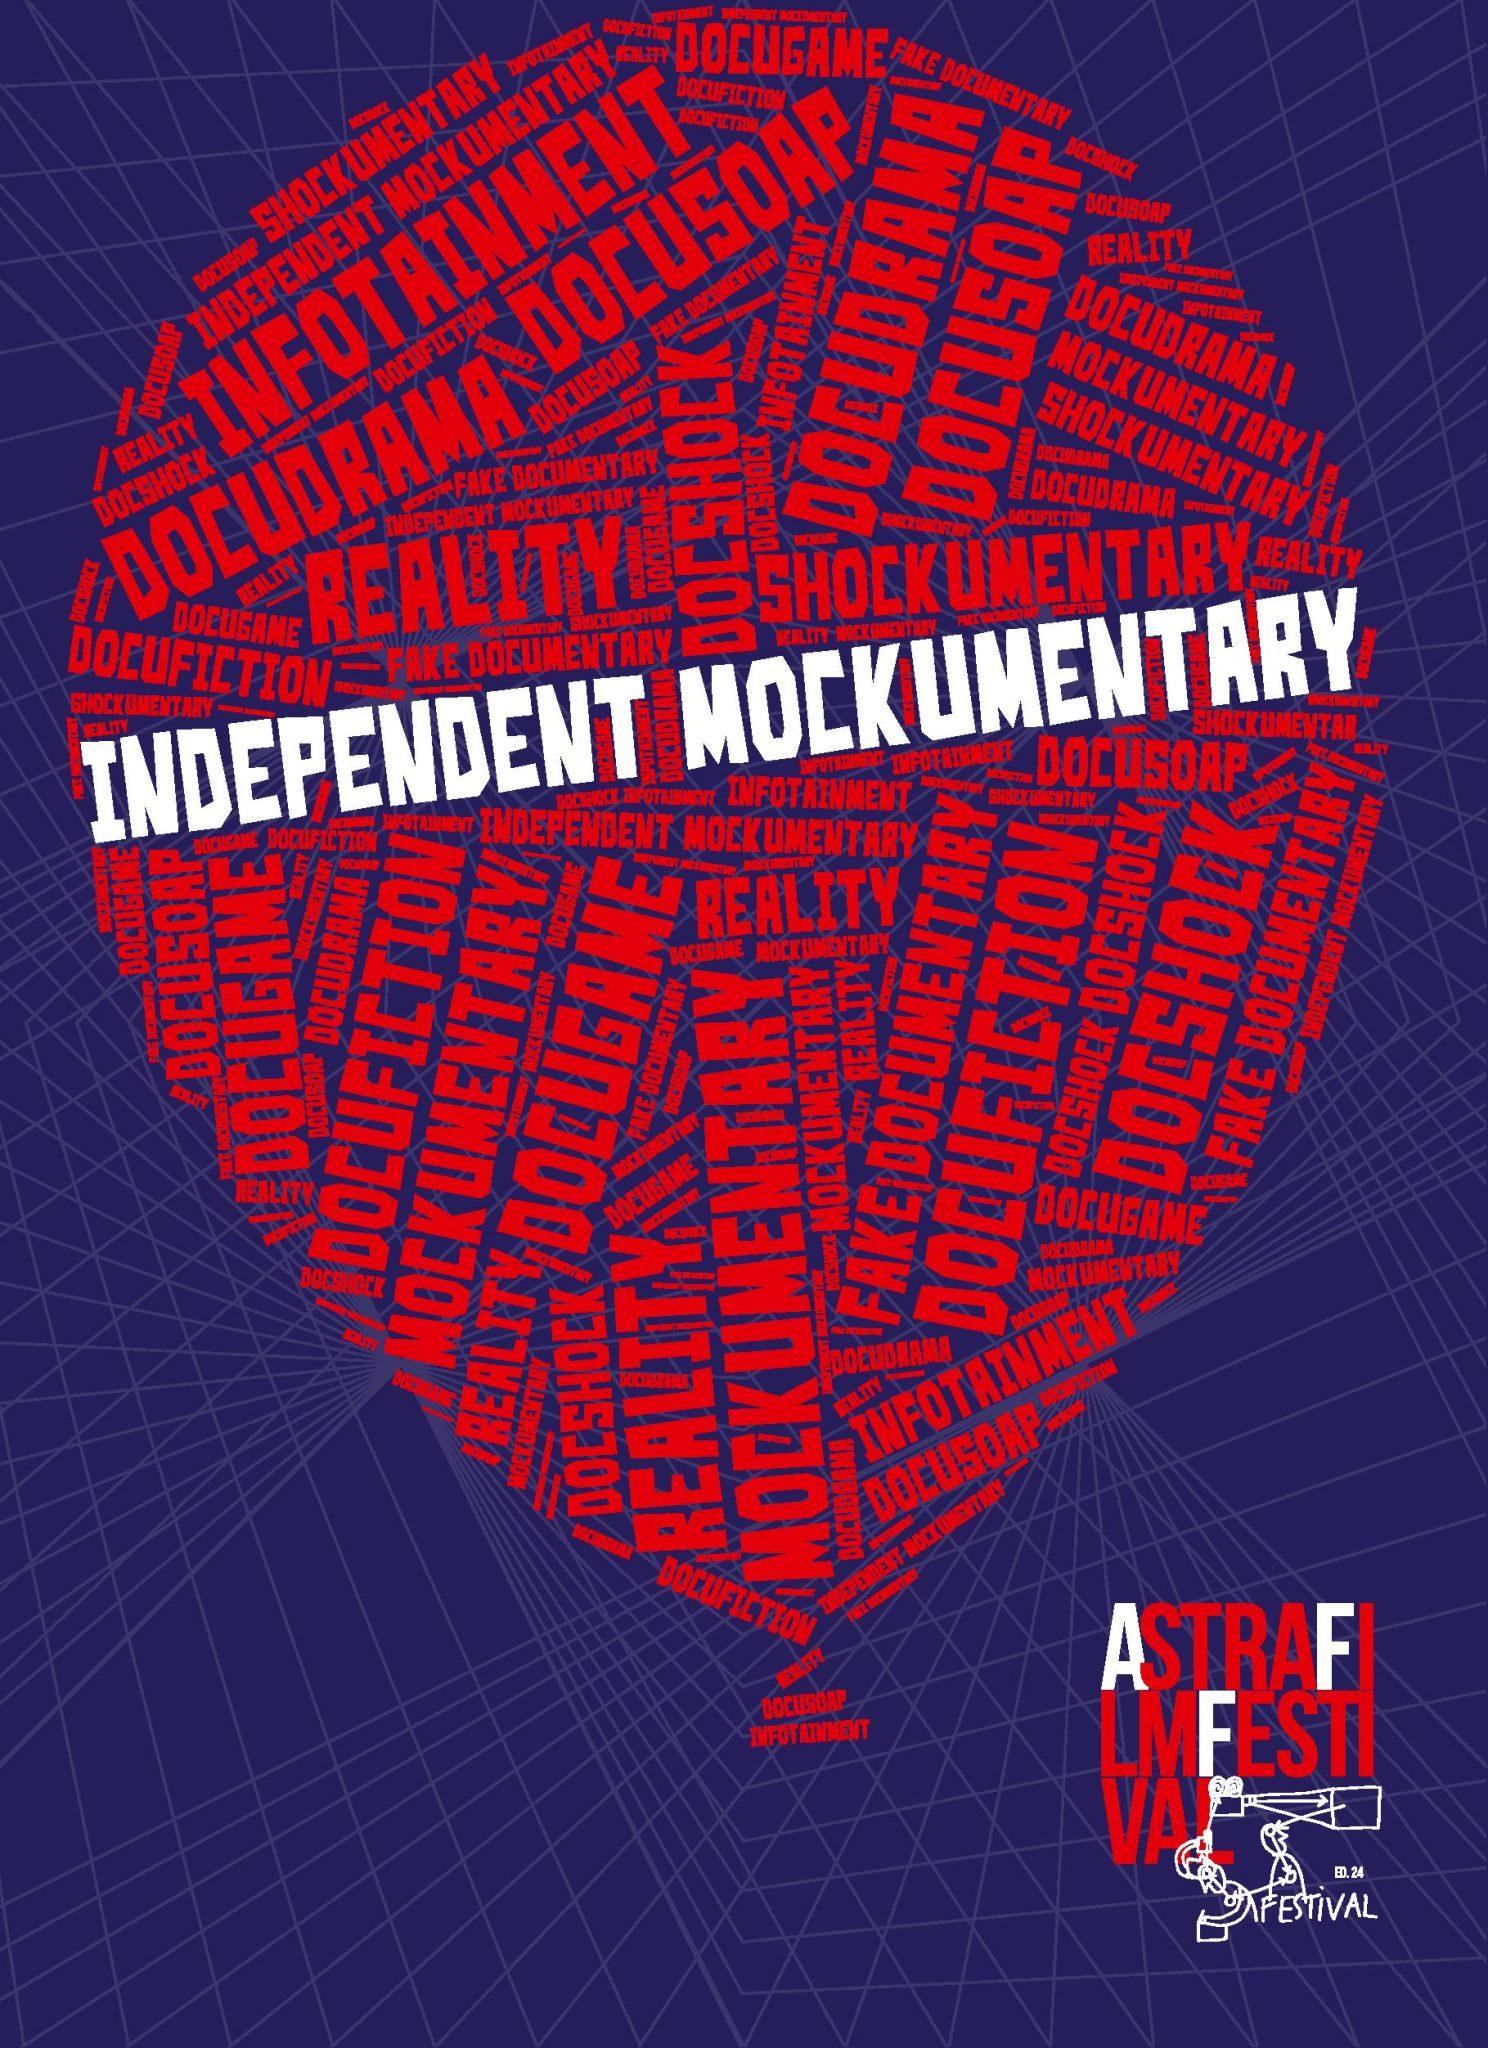 Astra film festival Mockumentary